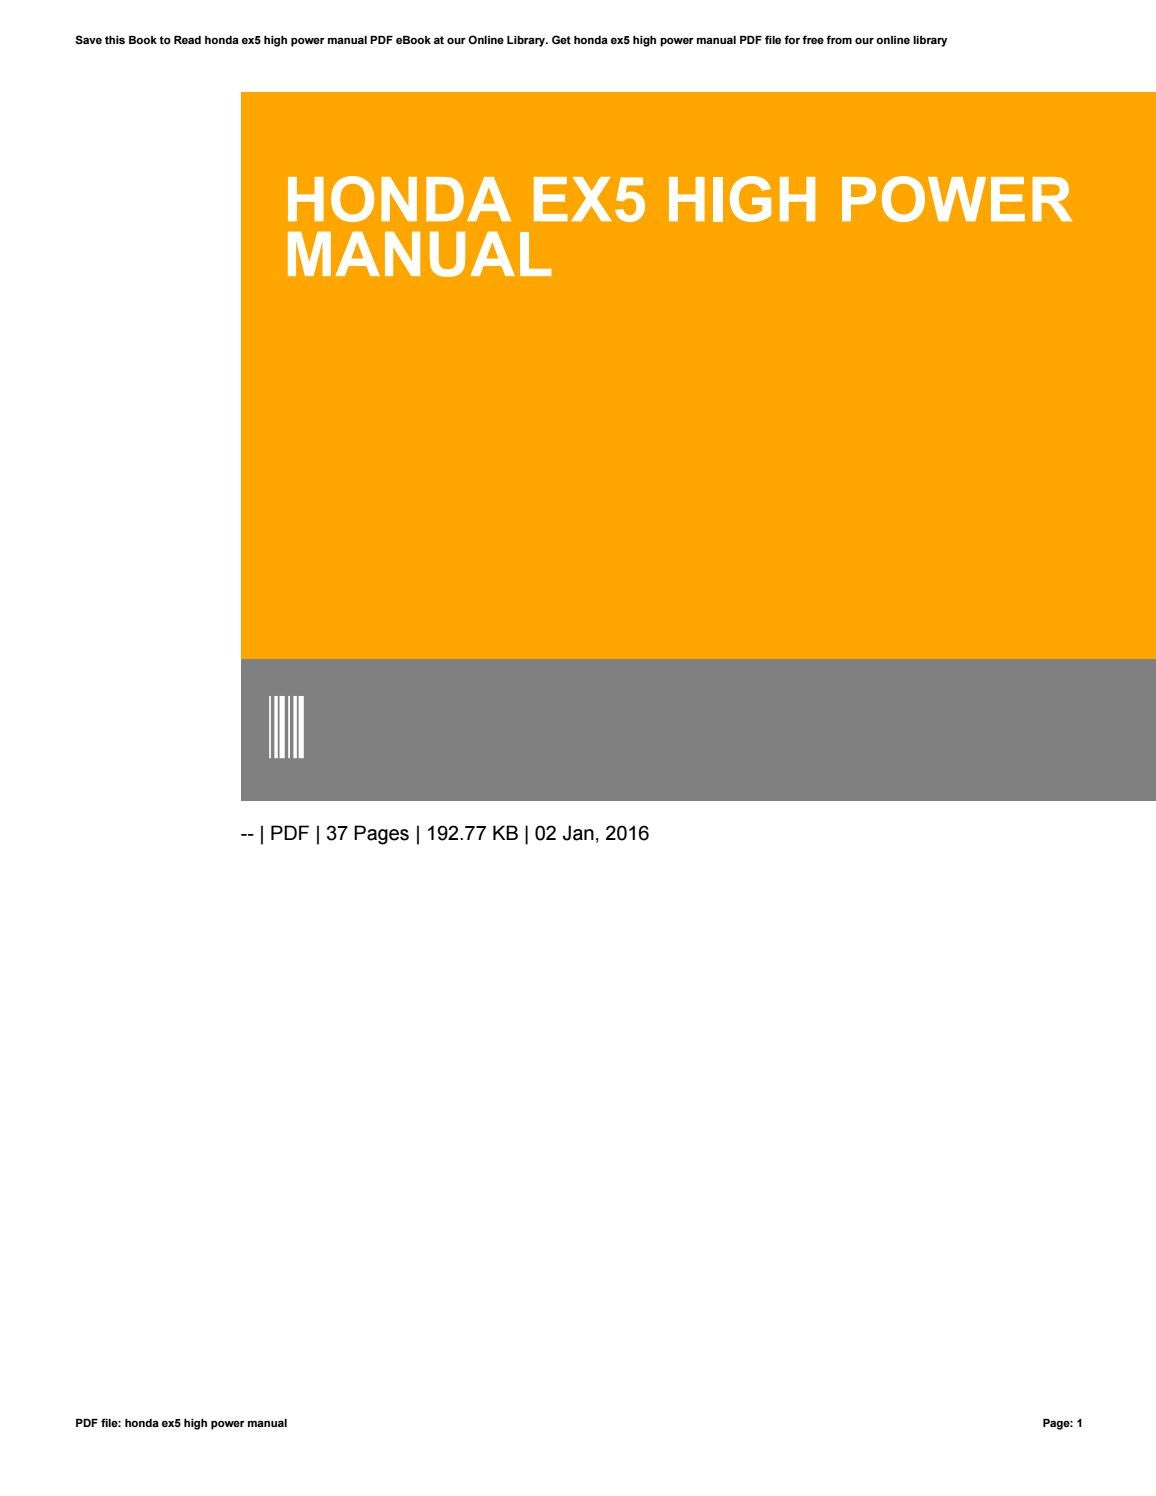 5915a5 Honda Ex5 High Power Manual By Gotimes99 Issuu Wiring Library